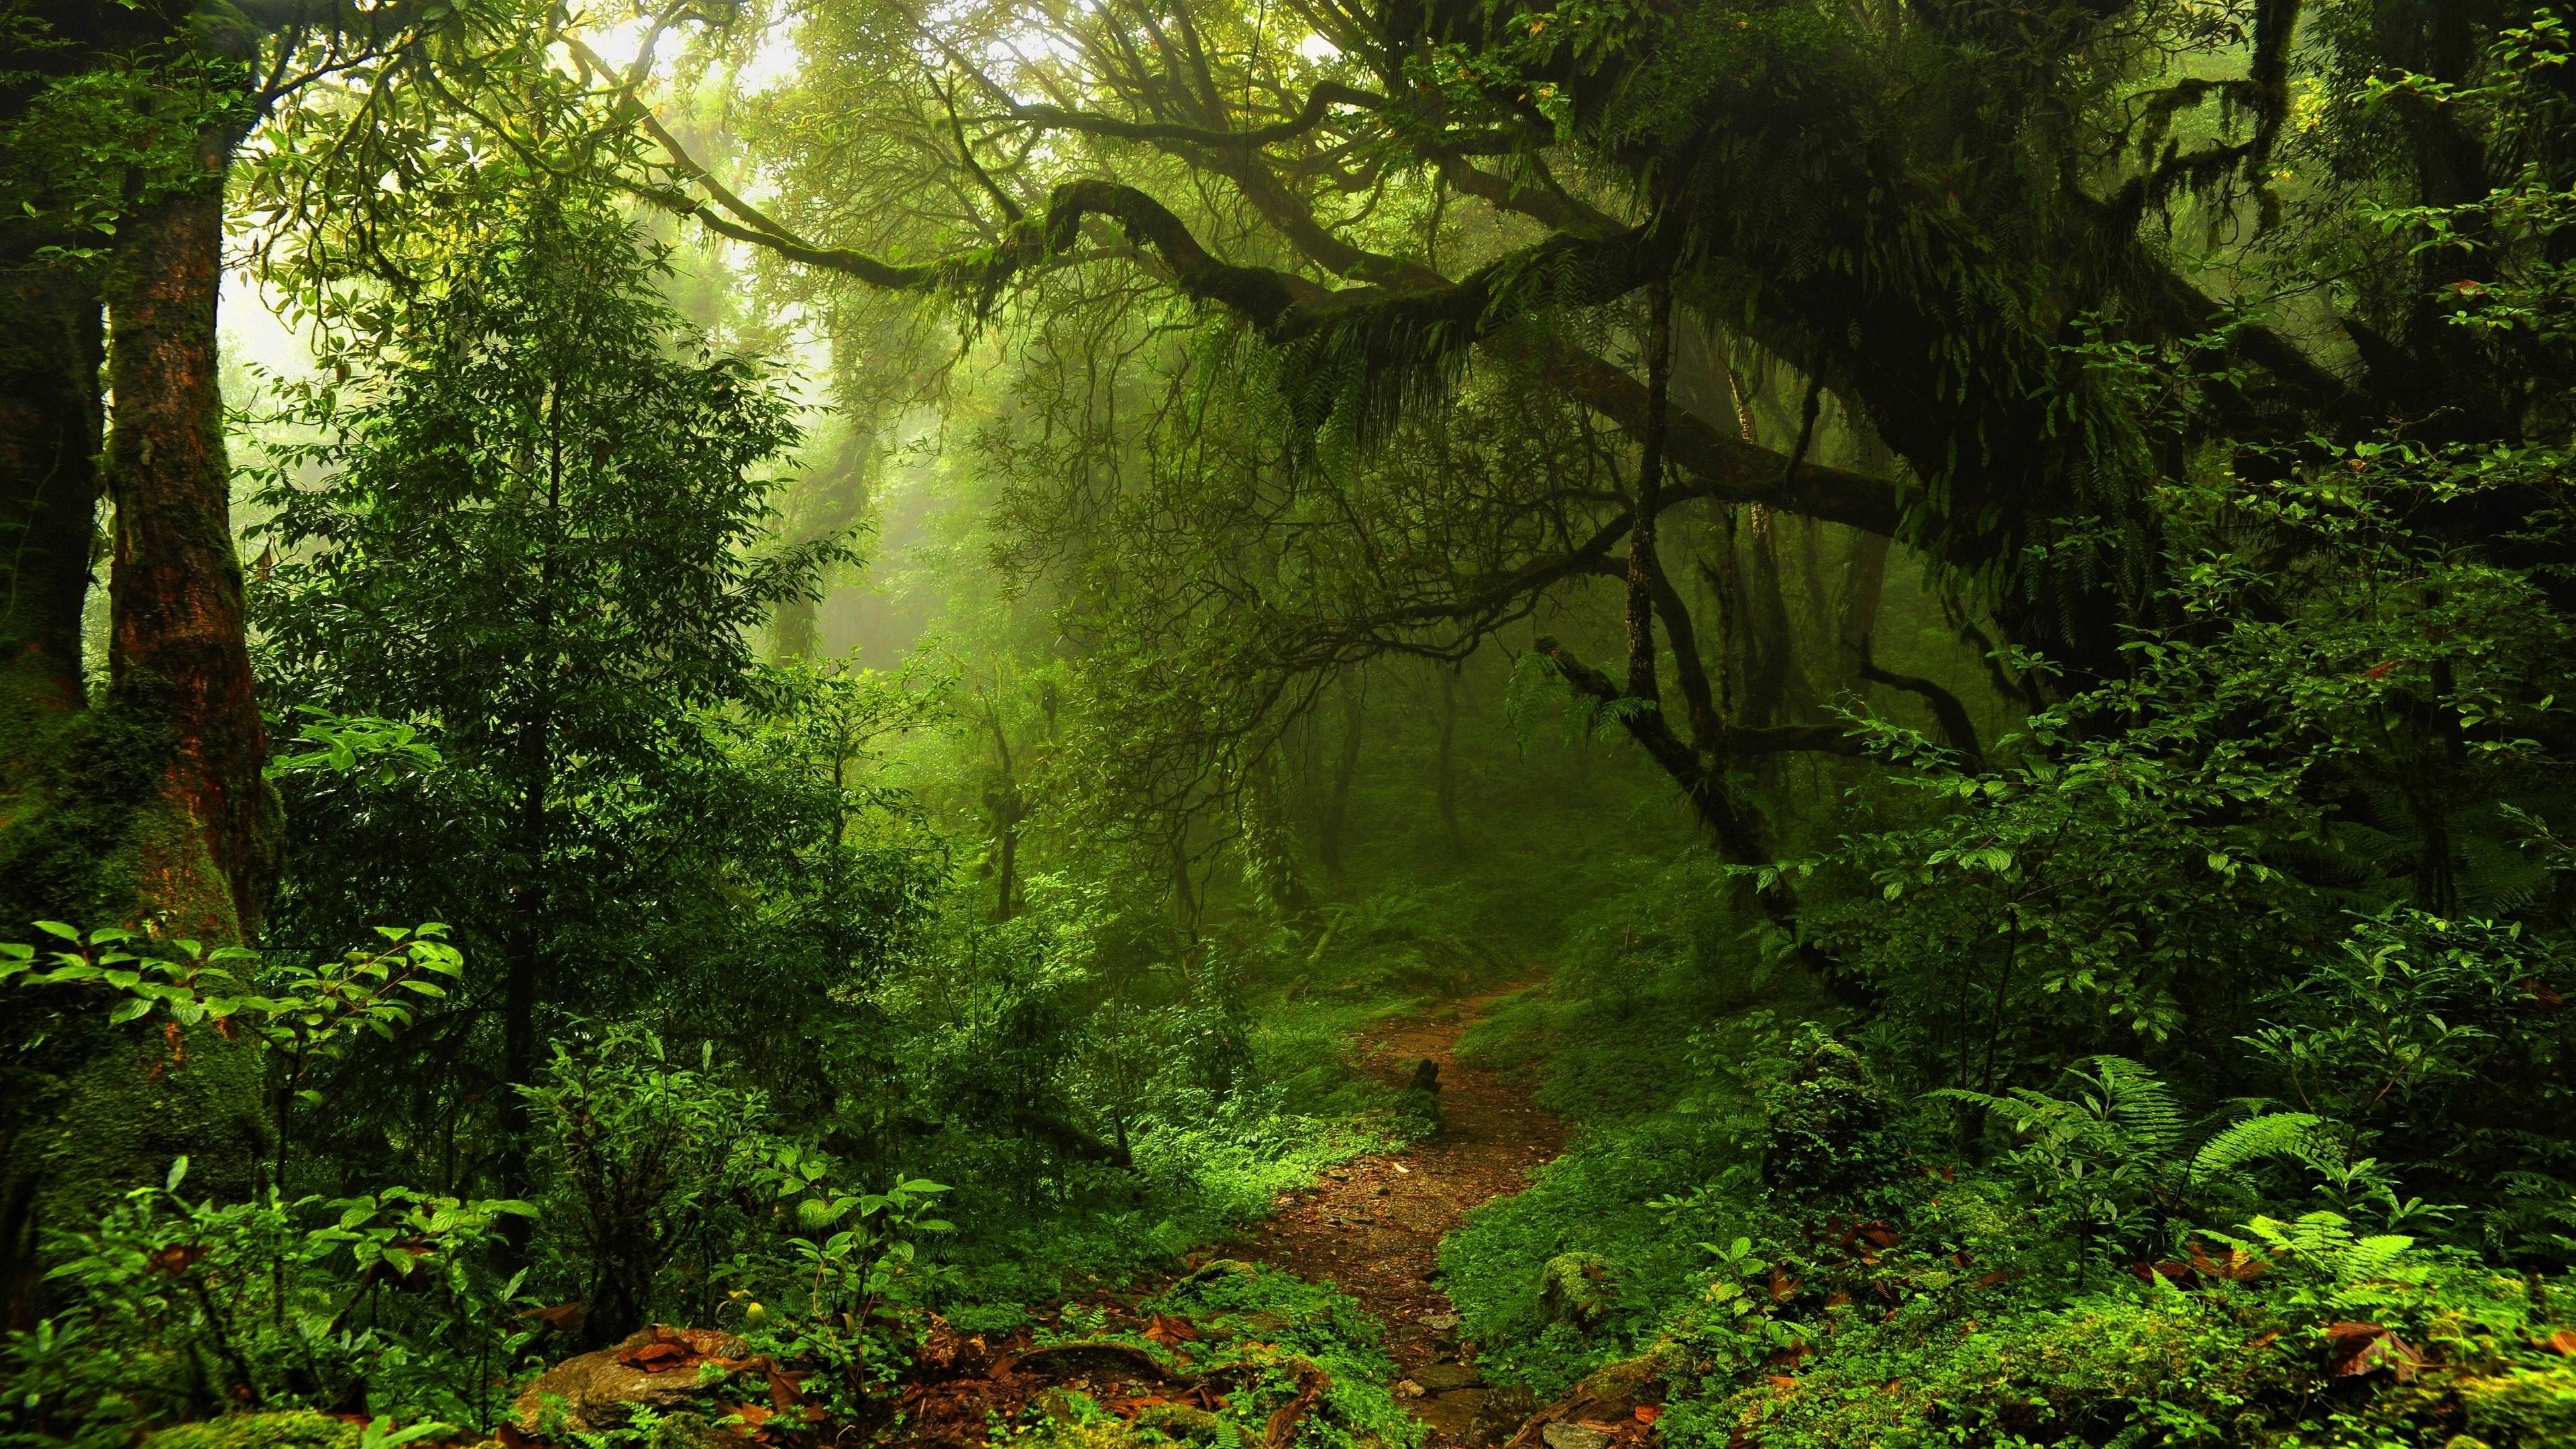 Forest Greenery Path Sunshine 3840x2160